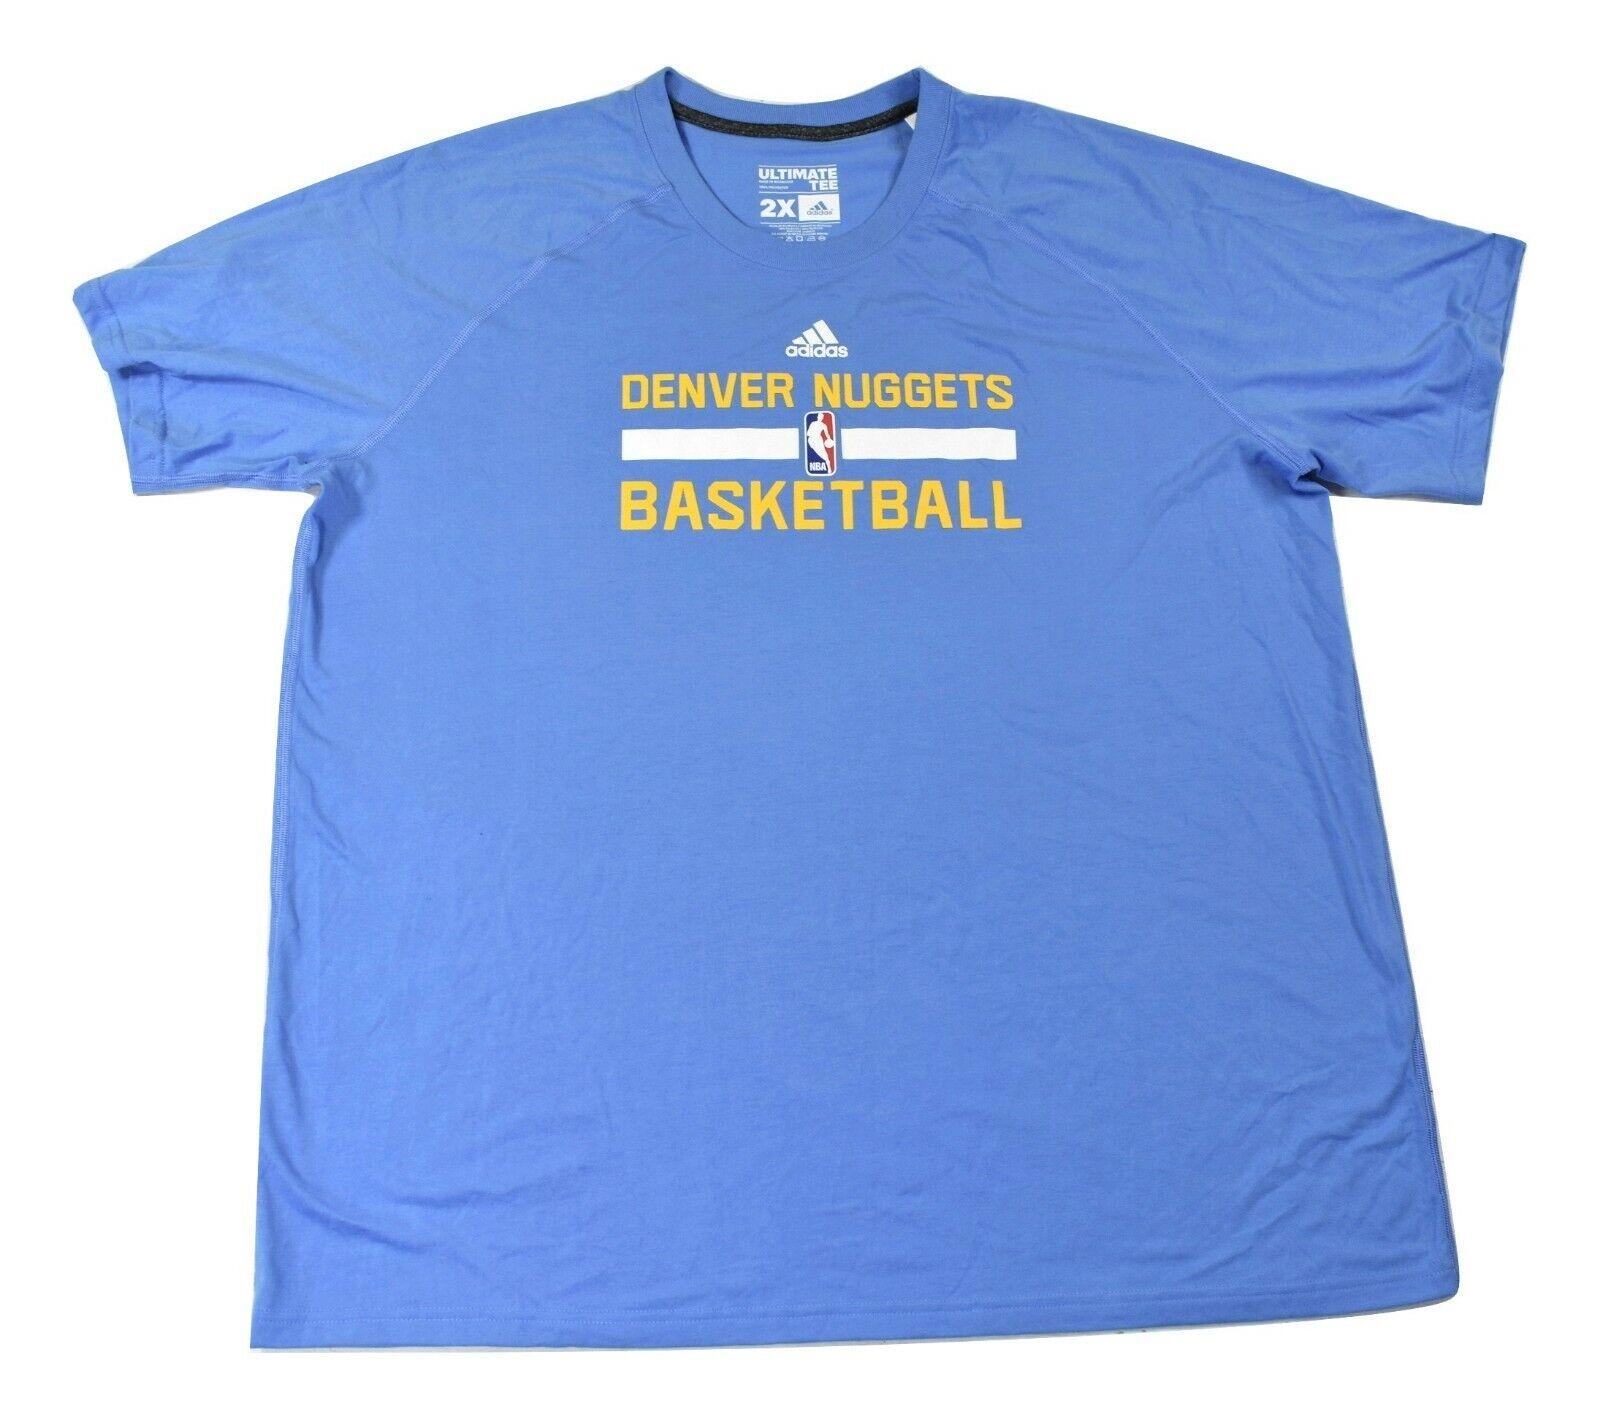 adidas Mens NBA Denver Nuggets Basketball Shirt New XLT, 2XL